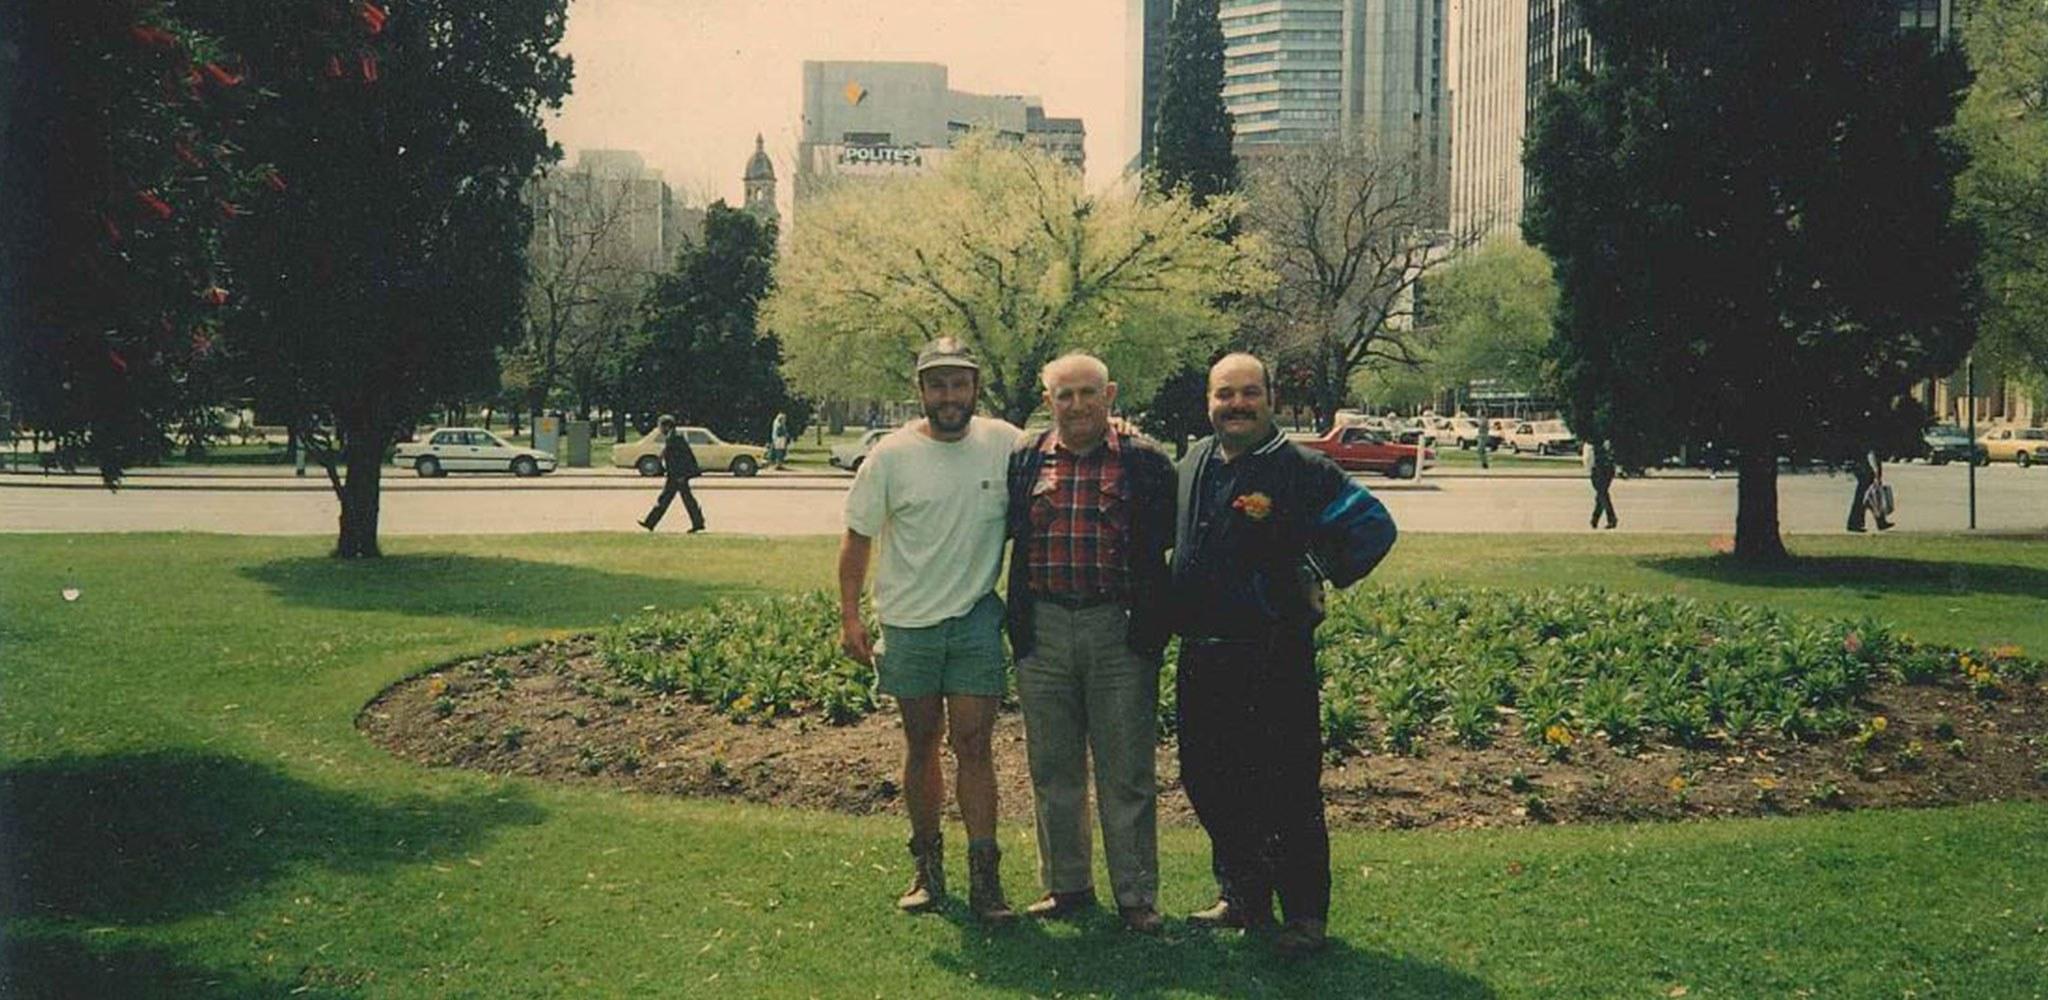 Vic square 1993